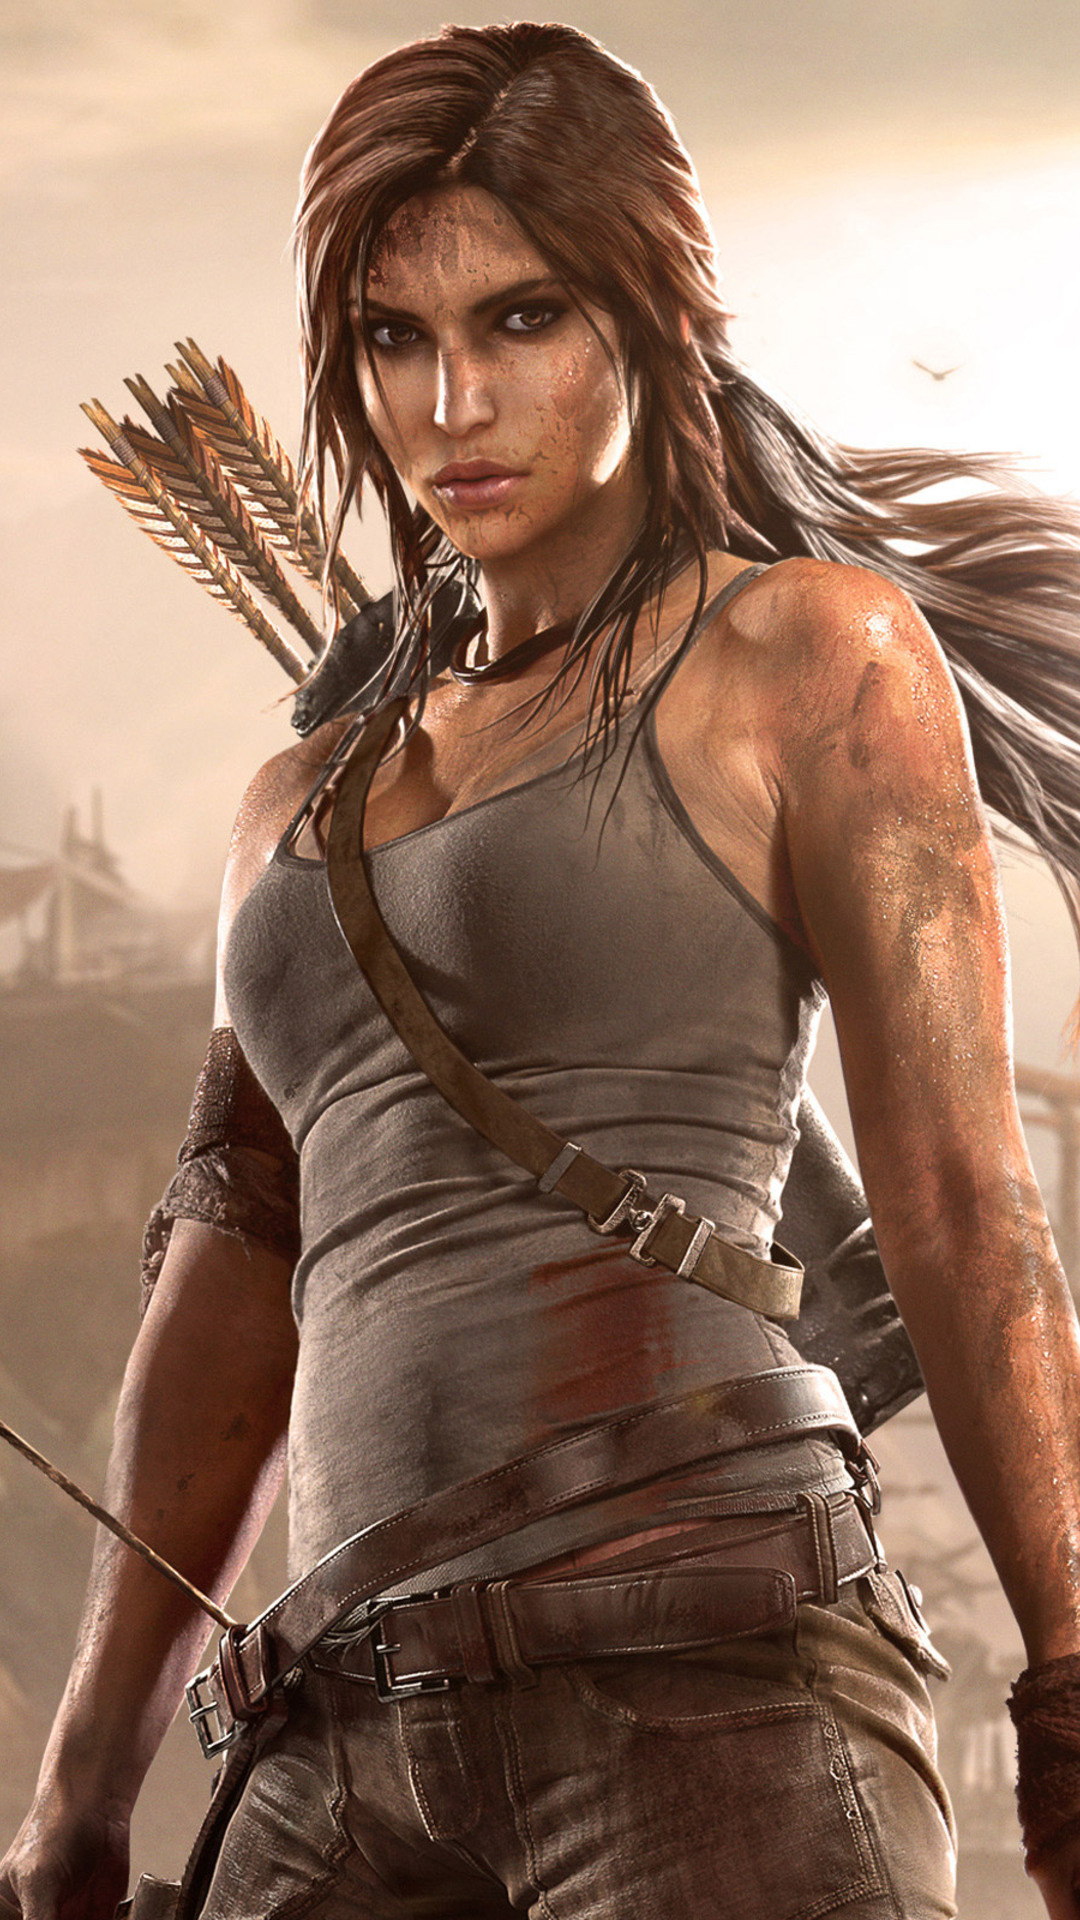 1080x1920 Lara Croft Arts Iphone 7,6s,6 Plus, Pixel xl ...